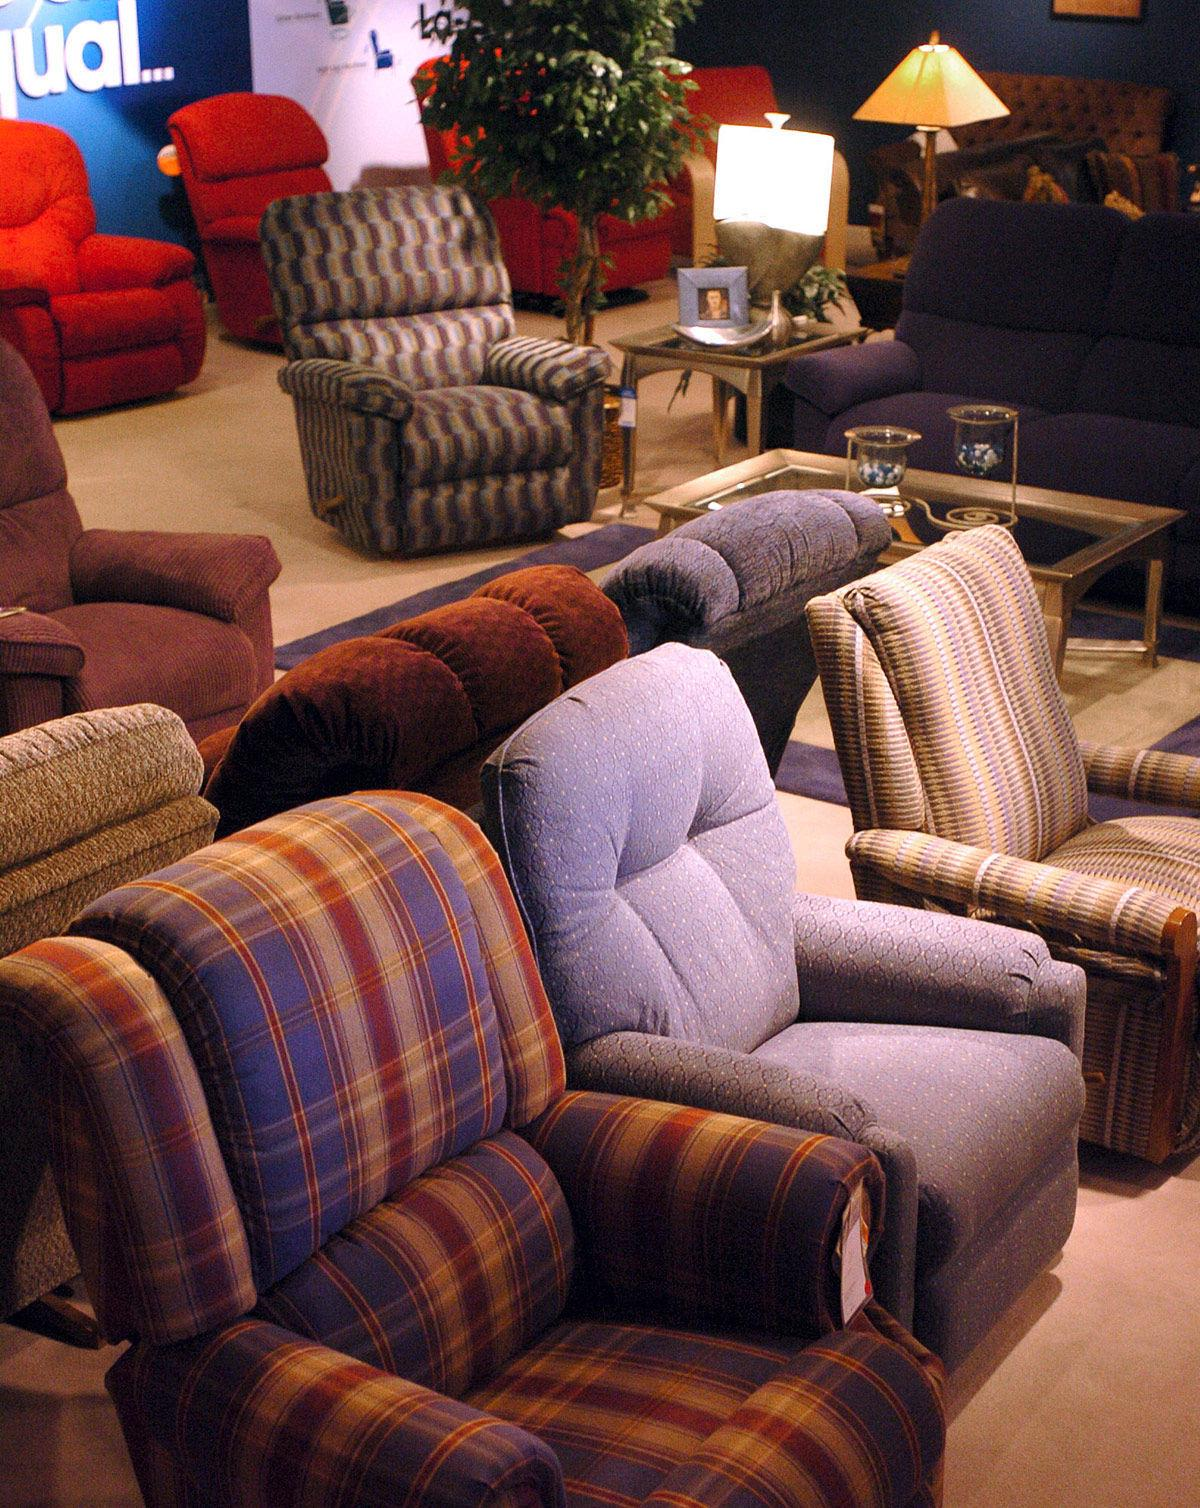 kings county business robinson plans la z boy furniture store in